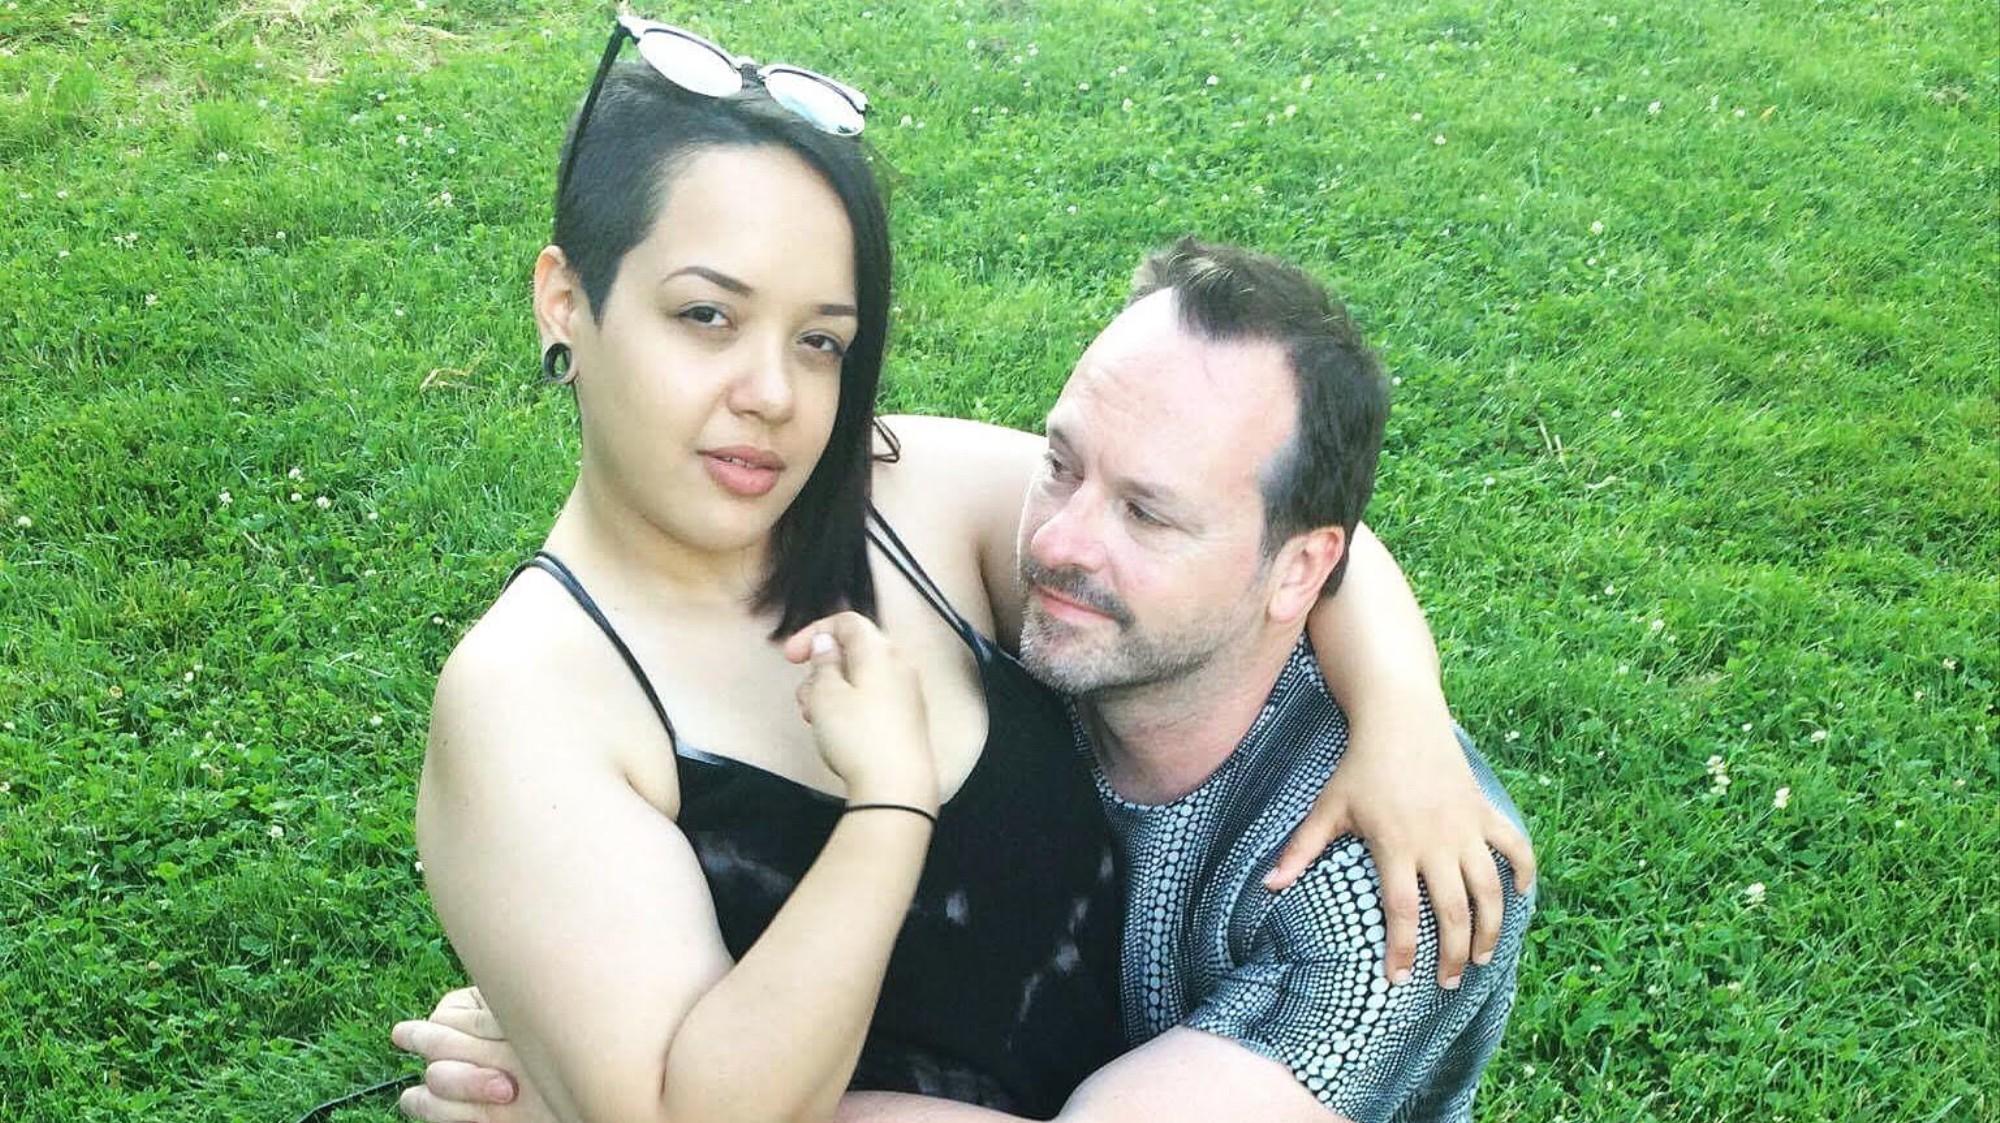 Poly dating site Kanadainterracial dating Länsi-Australia